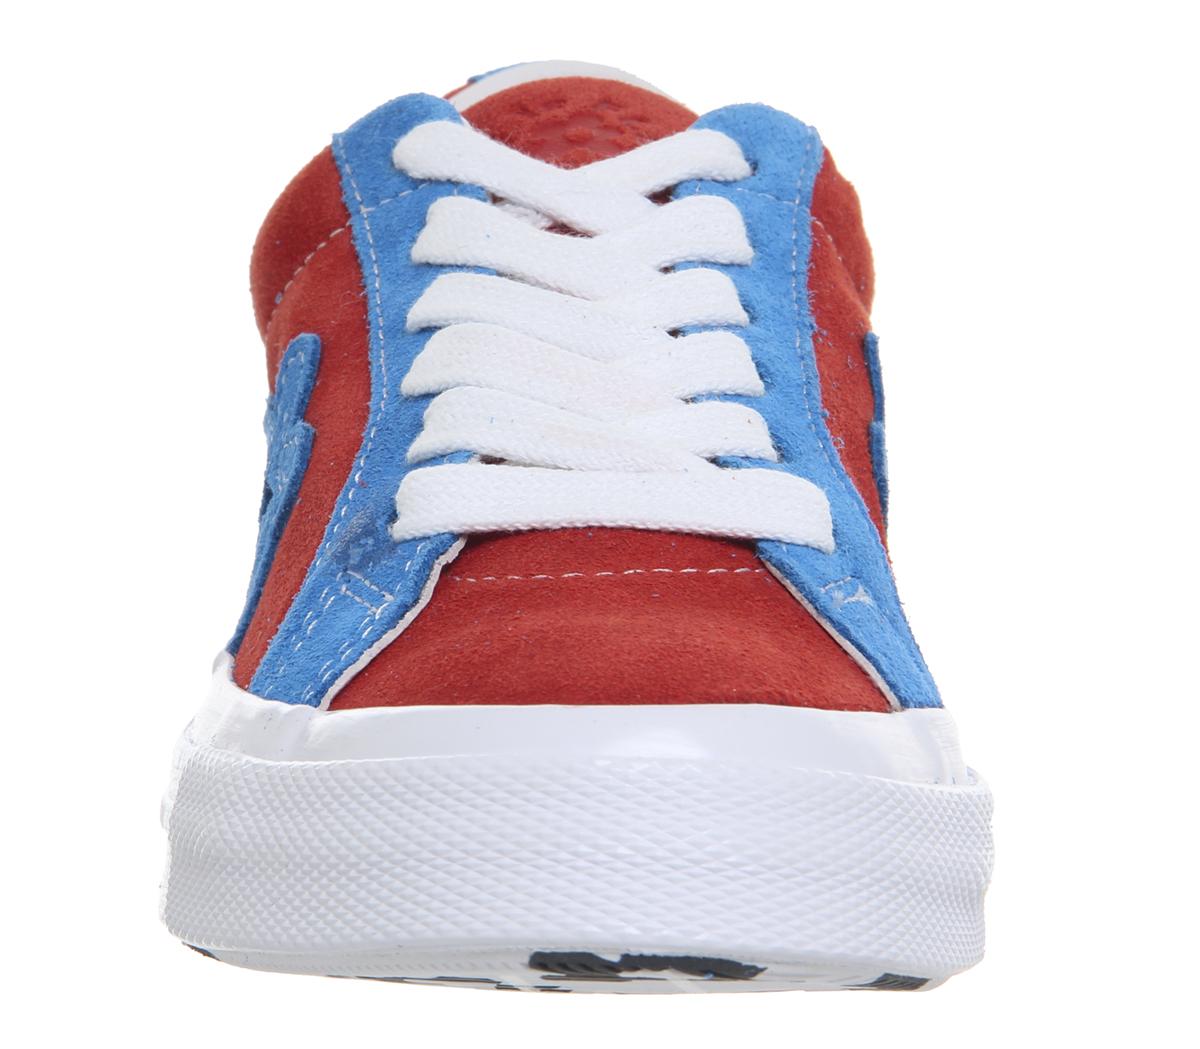 outlet store 048c2 2330d ... Men s Nike Nike Nike Air Max Motion Racer Running Shoes Cool Grey Black  NIB 916771 ...